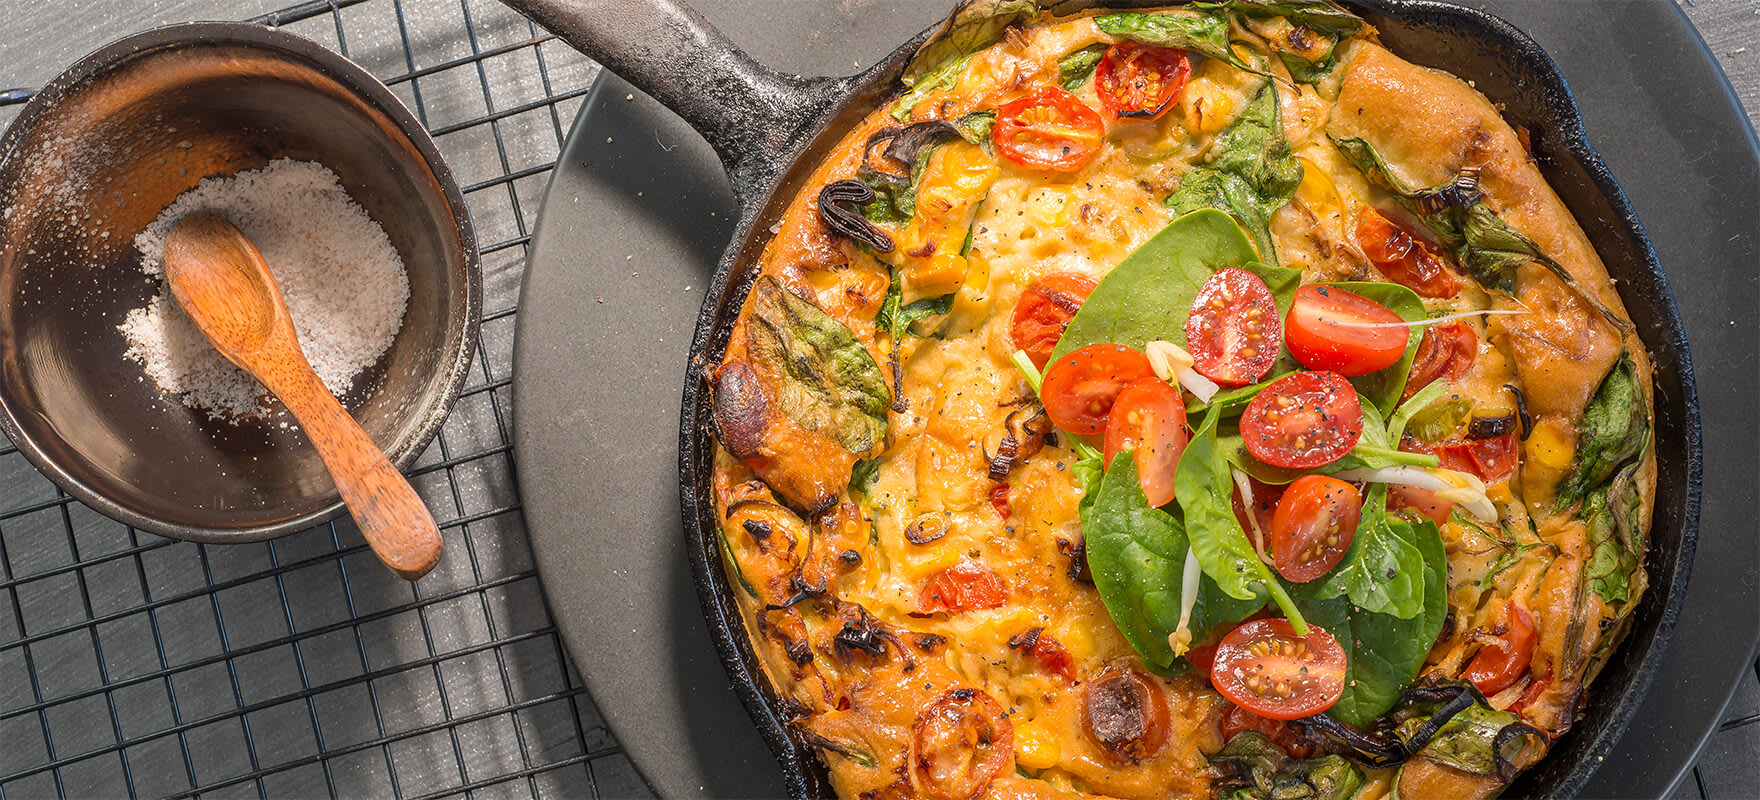 Vegetable bake image 1